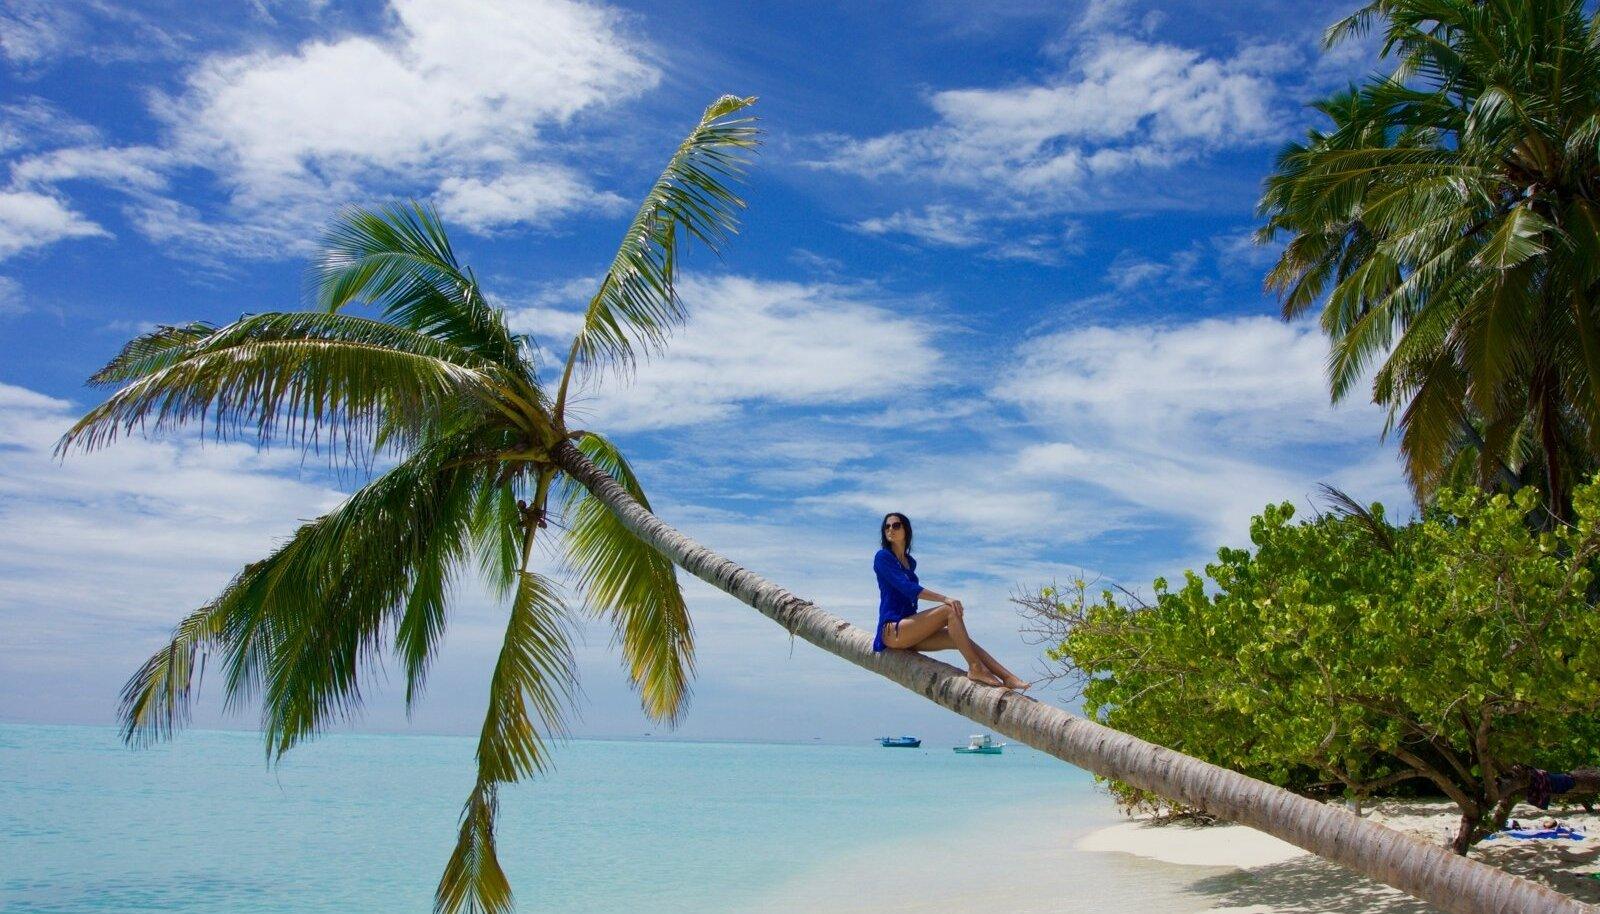 Maldiivid 2016